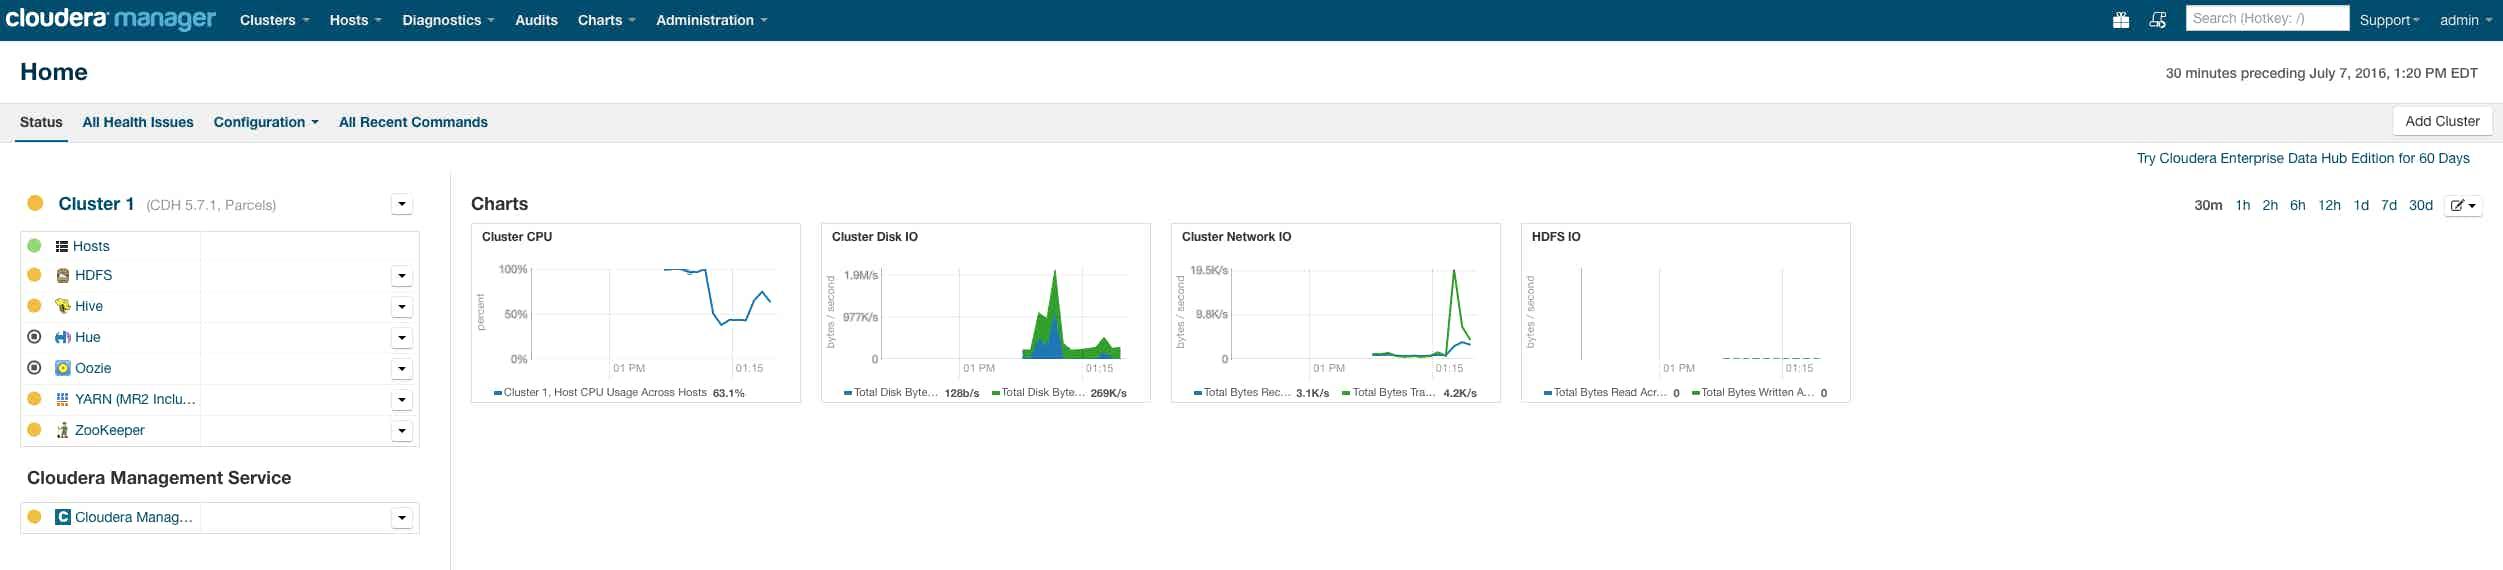 Hadoop YARN stats - Cloudera Manager installed